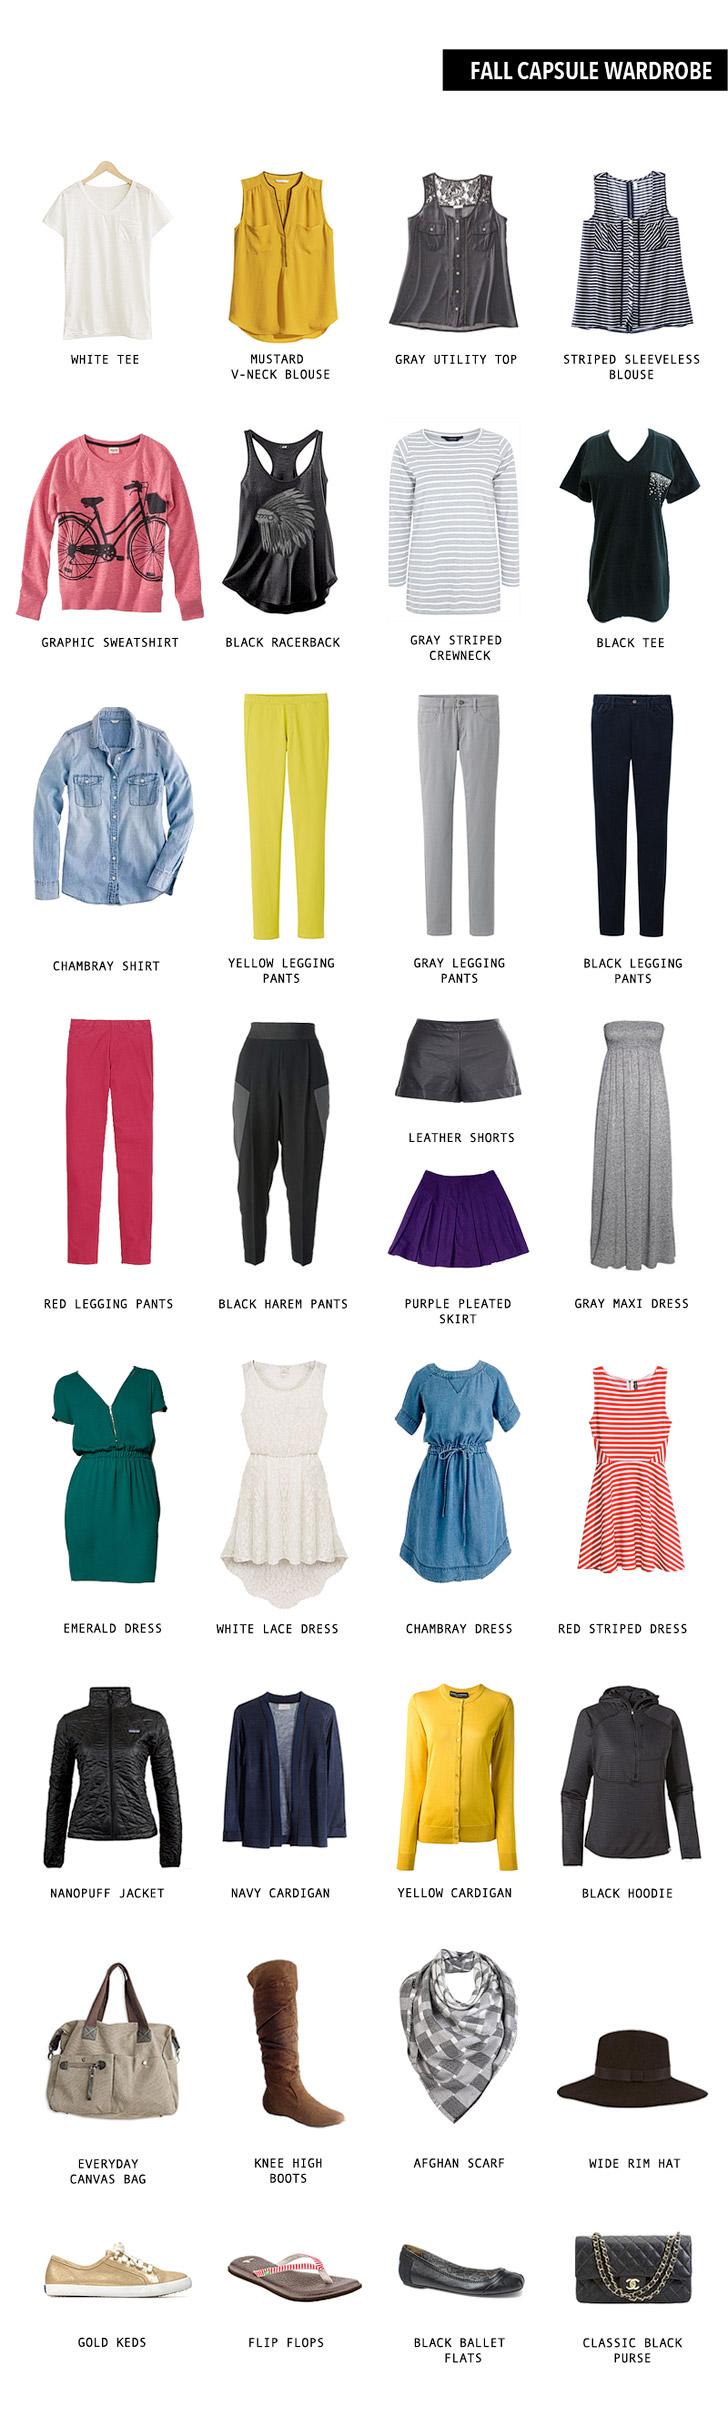 Essential Fall Capsule Wardrobe – Project 333